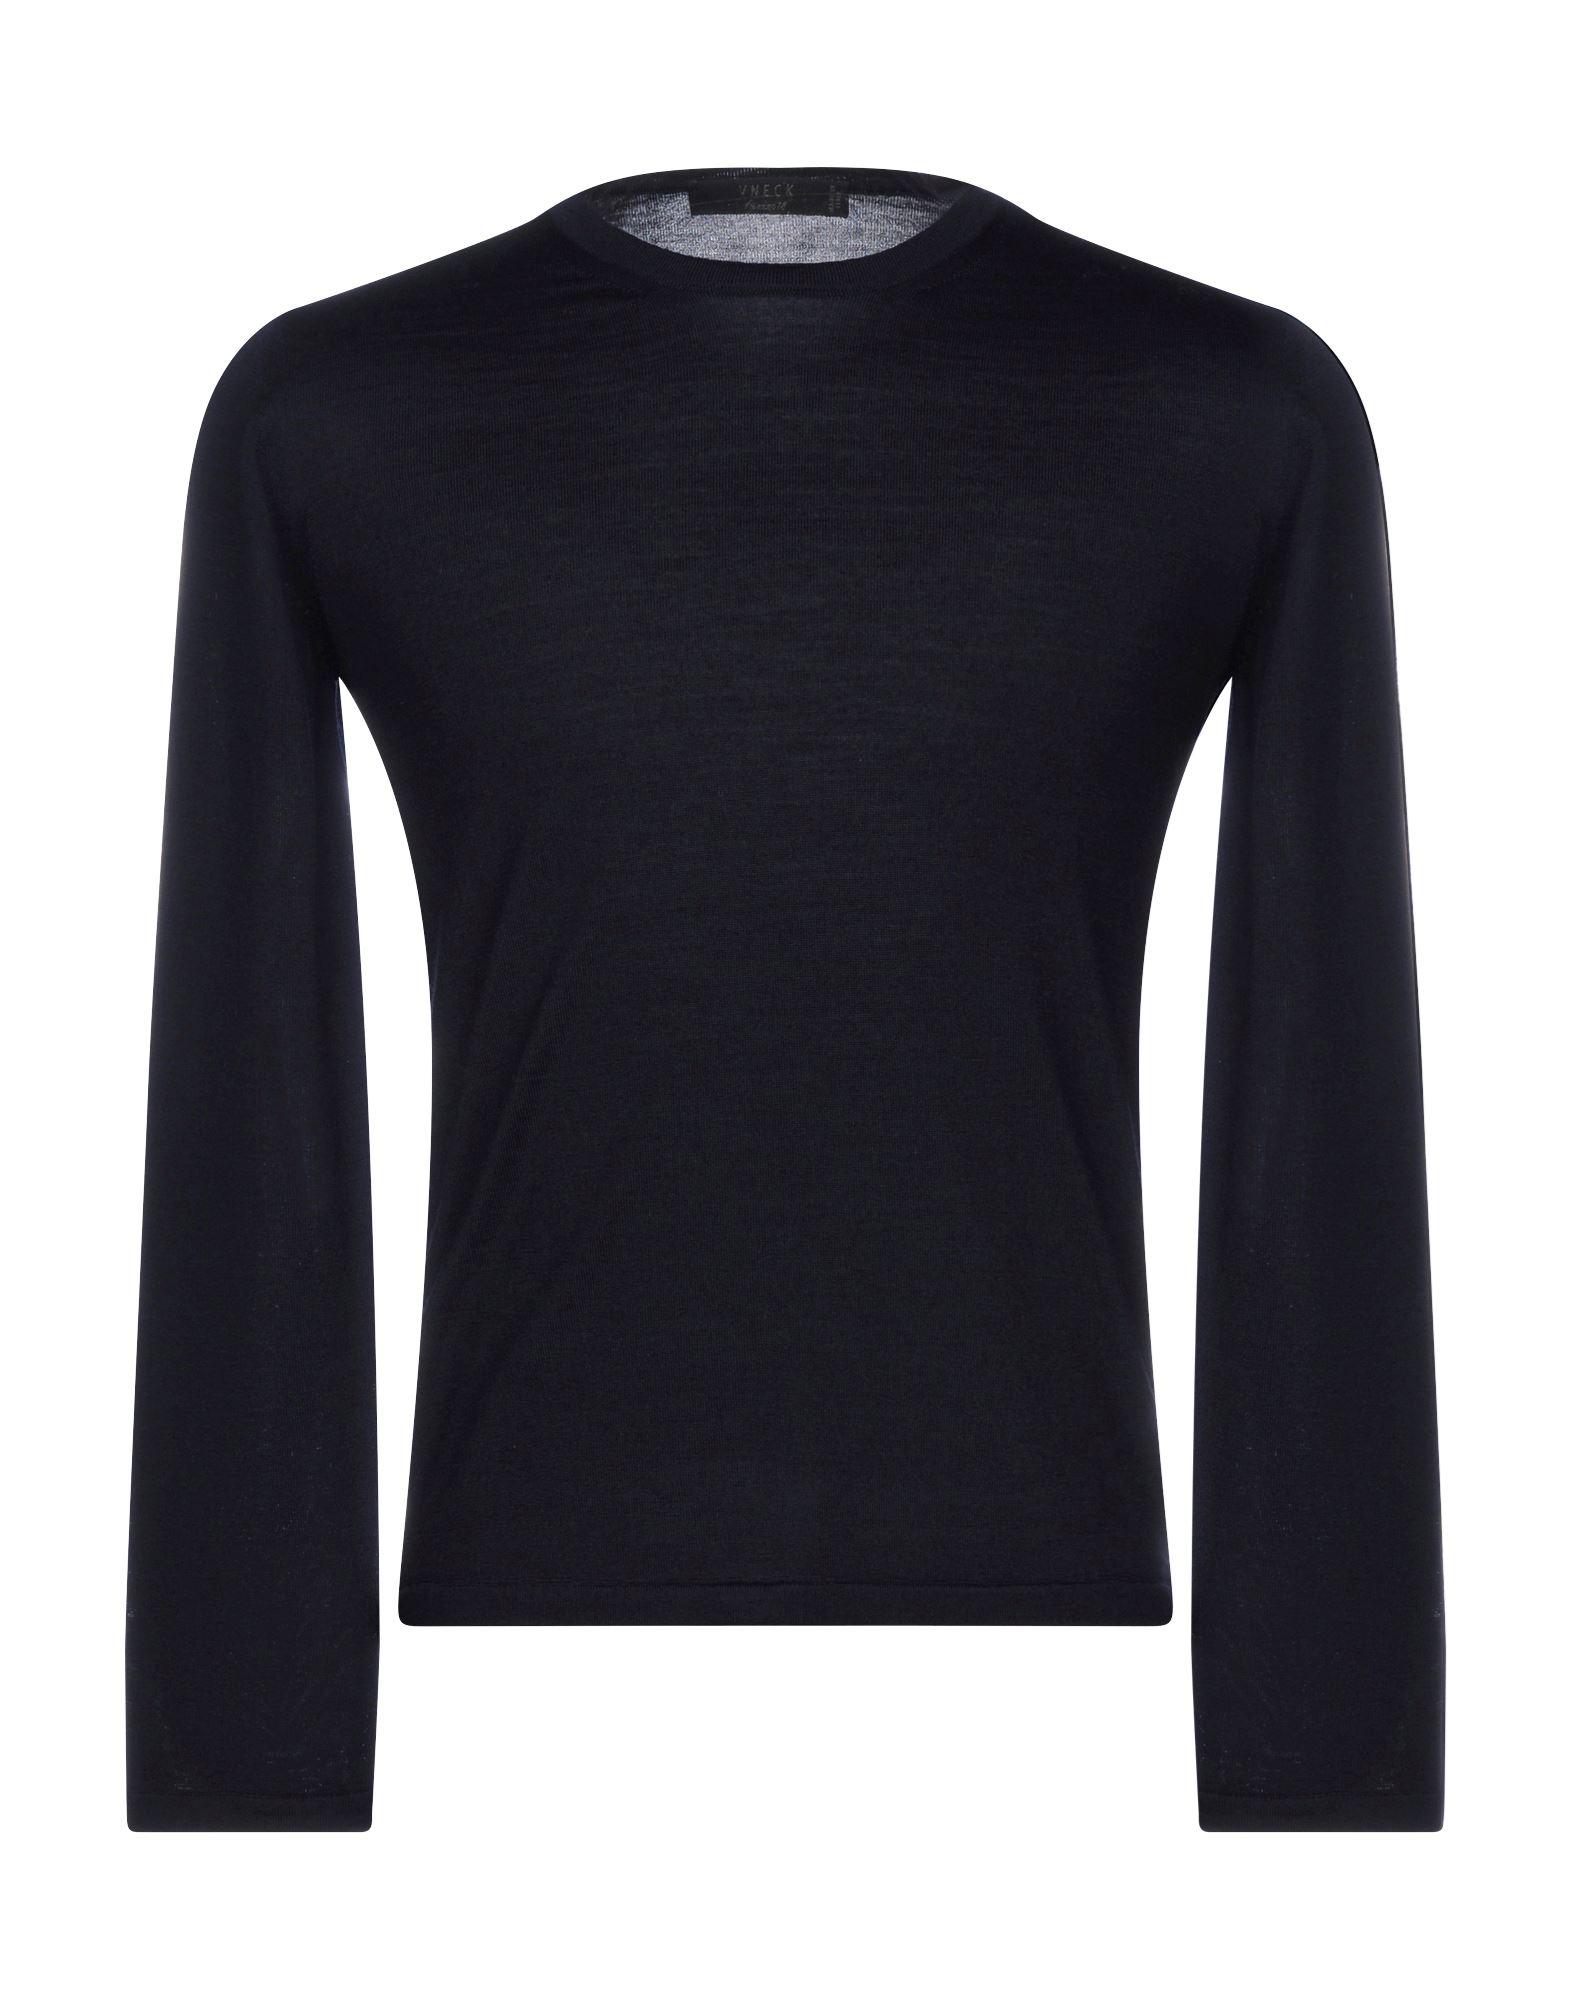 Pullover Vneck Donna - Acquista online su